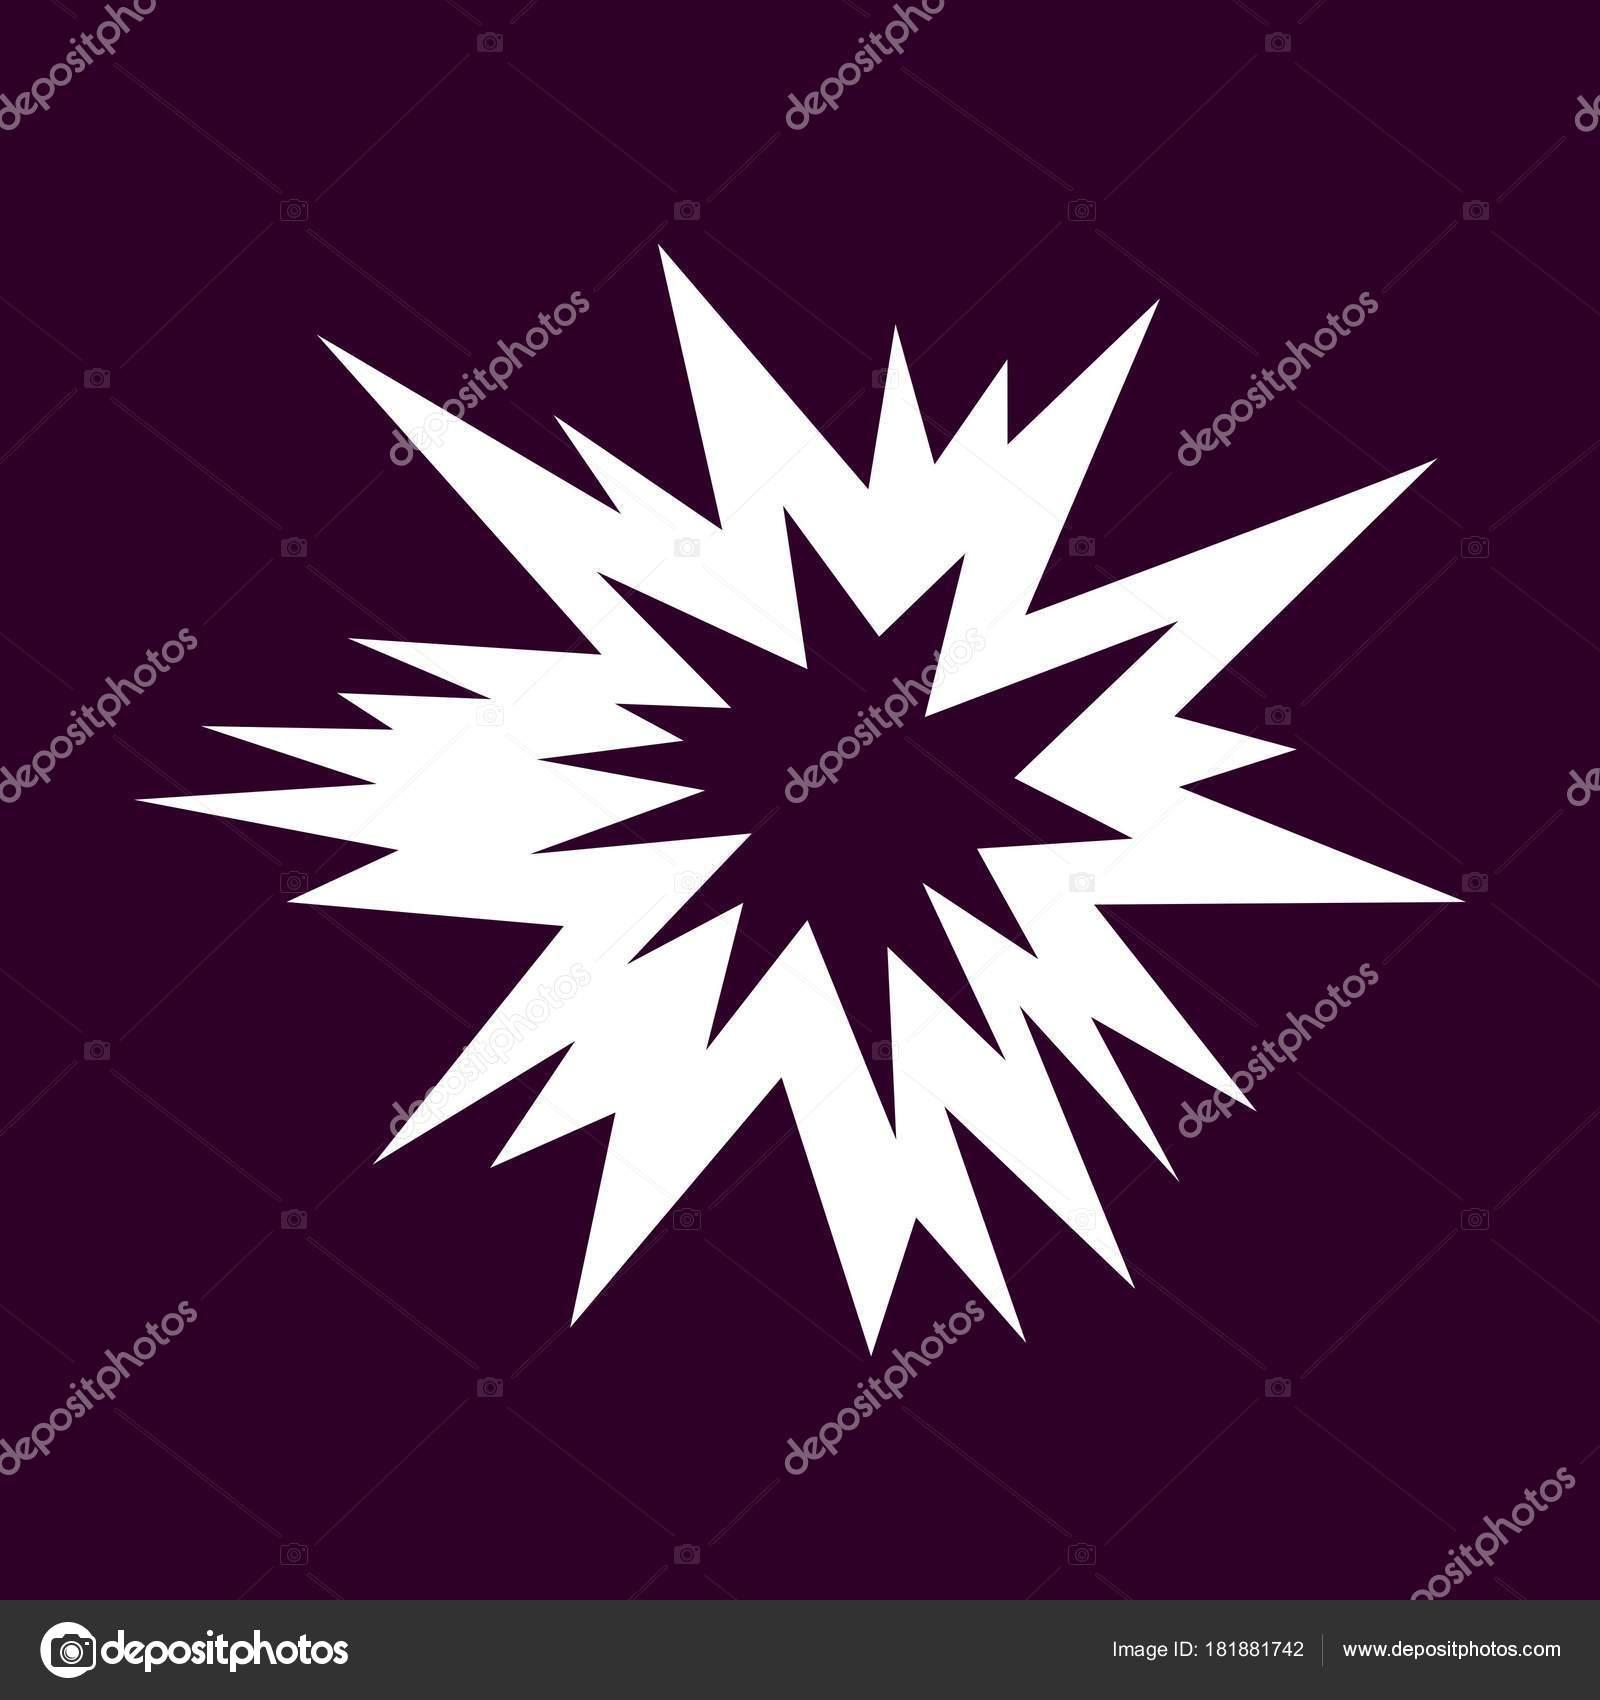 Explosion vector symbol black background stock vector den explosion vector symbol black background stock vector buycottarizona